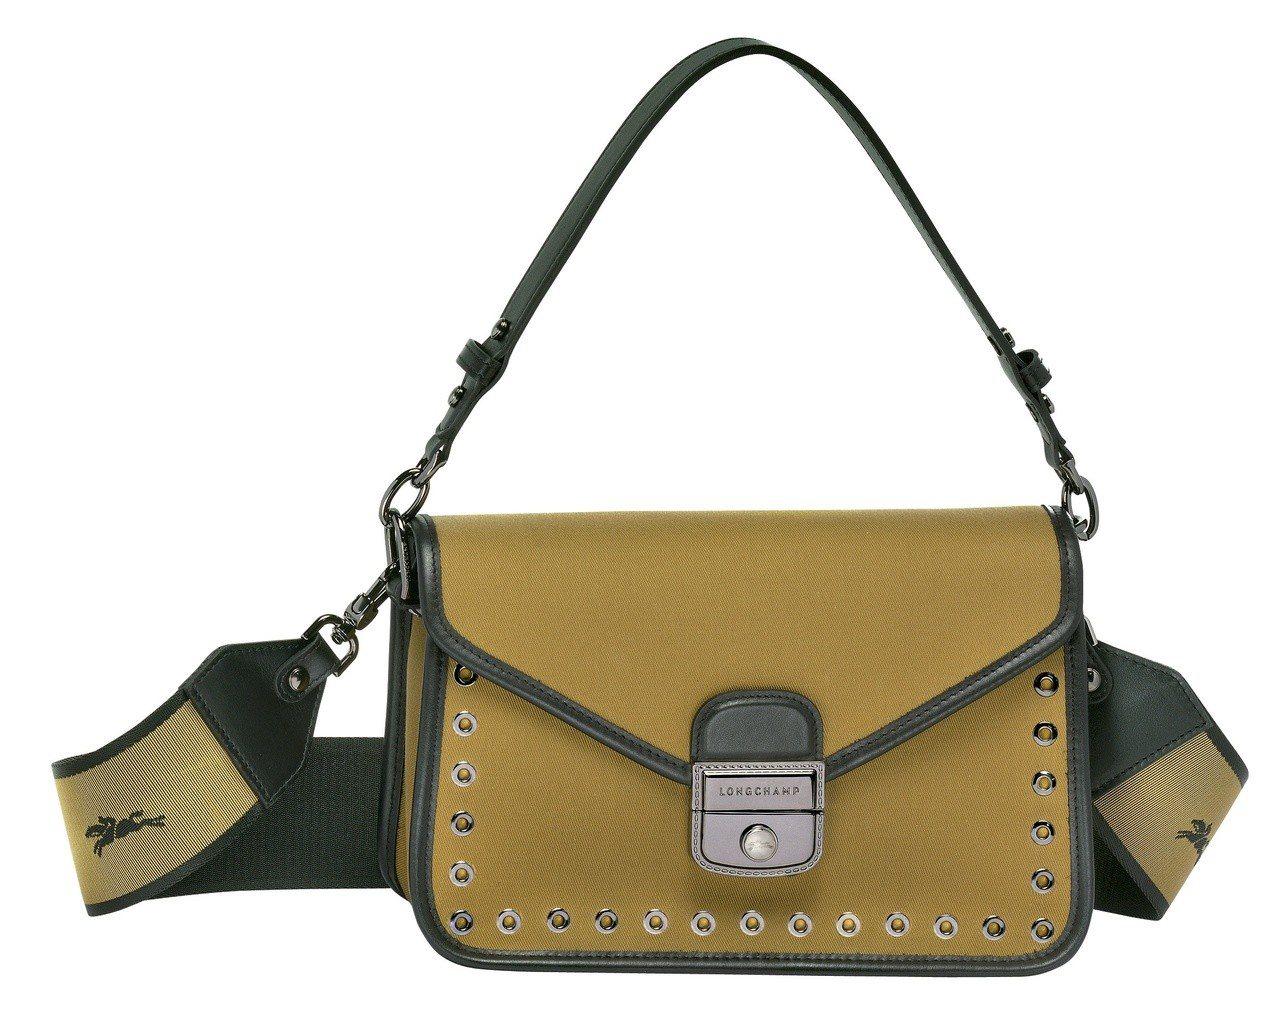 Mademoiselle Longchamp Toile卡其色荷篷包,售價21,...